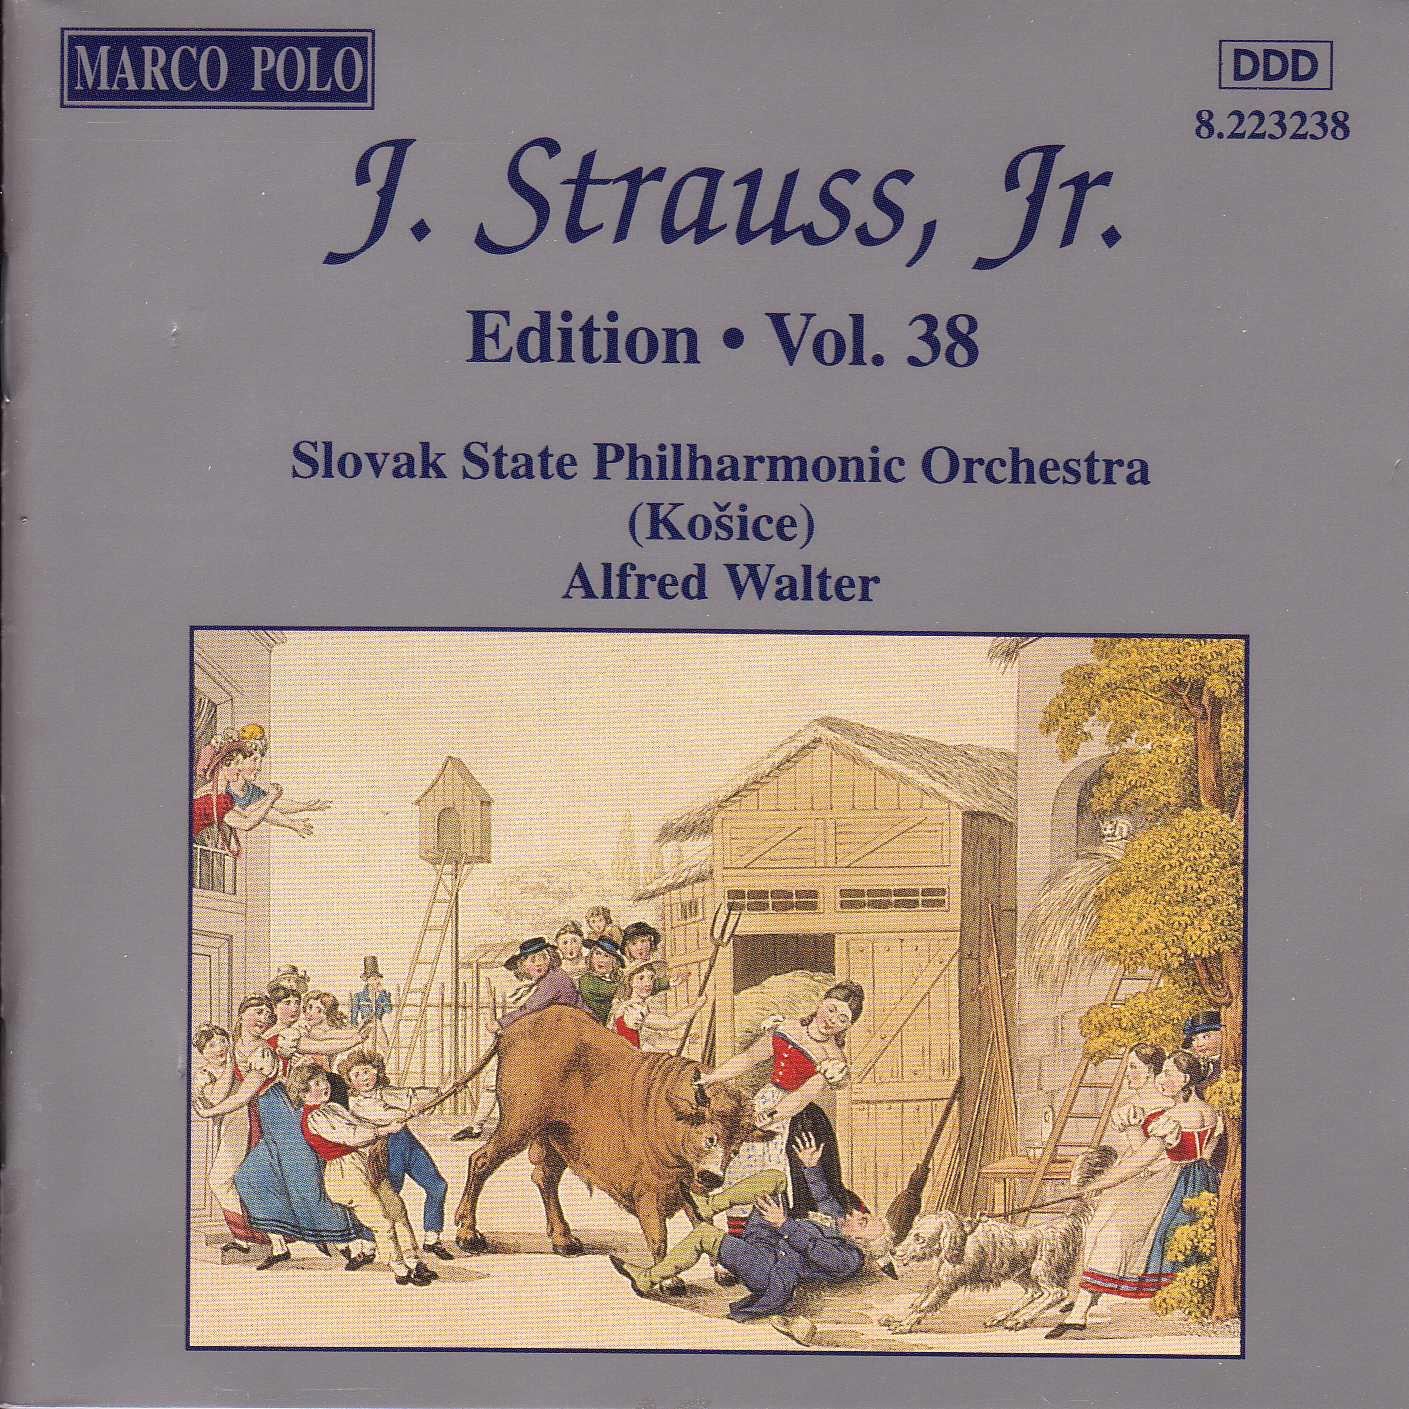 STRAUSS II, J.: Edition - Vol. 38 Classical Naxos - Marco Polo